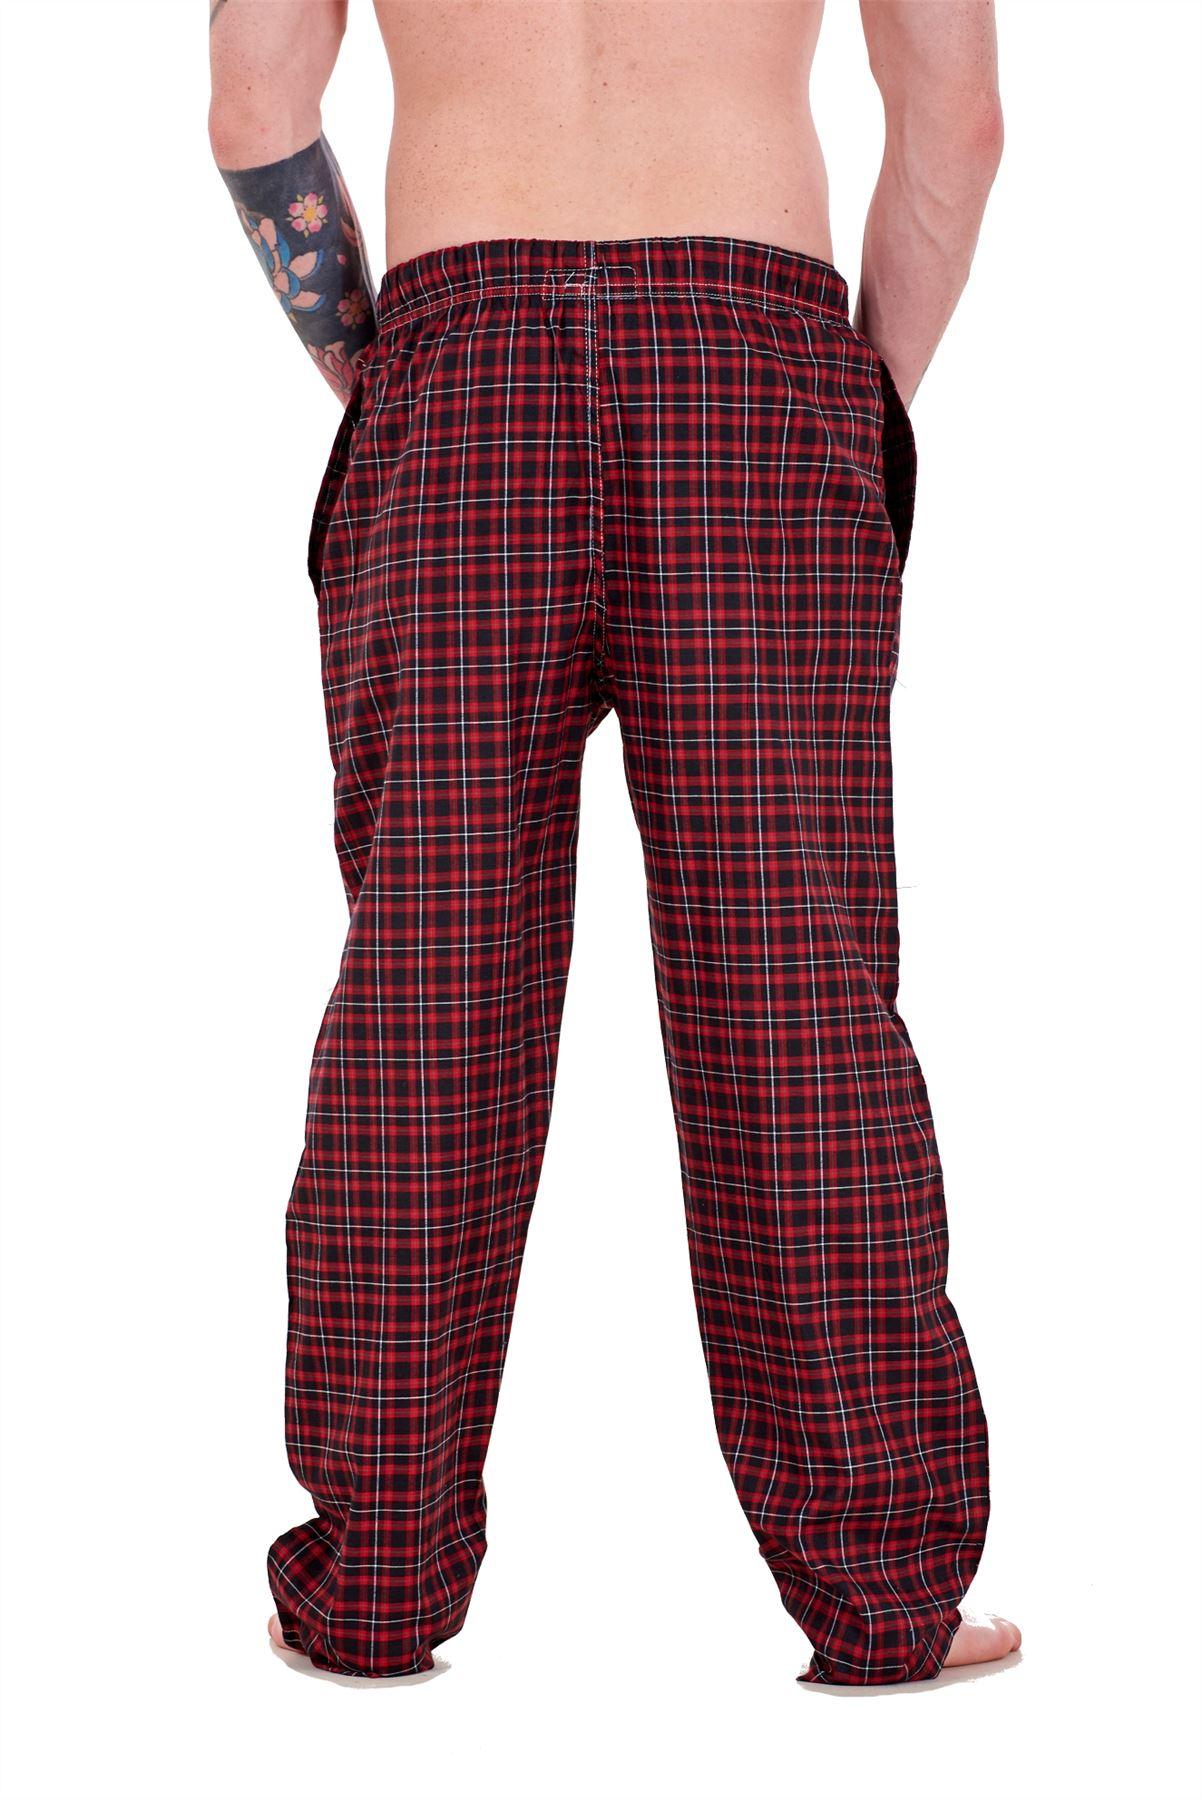 Mens-Pyjama-Bottoms-Rich-Cotton-Woven-Check-Lounge-Pant-Nightwear-Big-3XL-to-5XL Indexbild 57